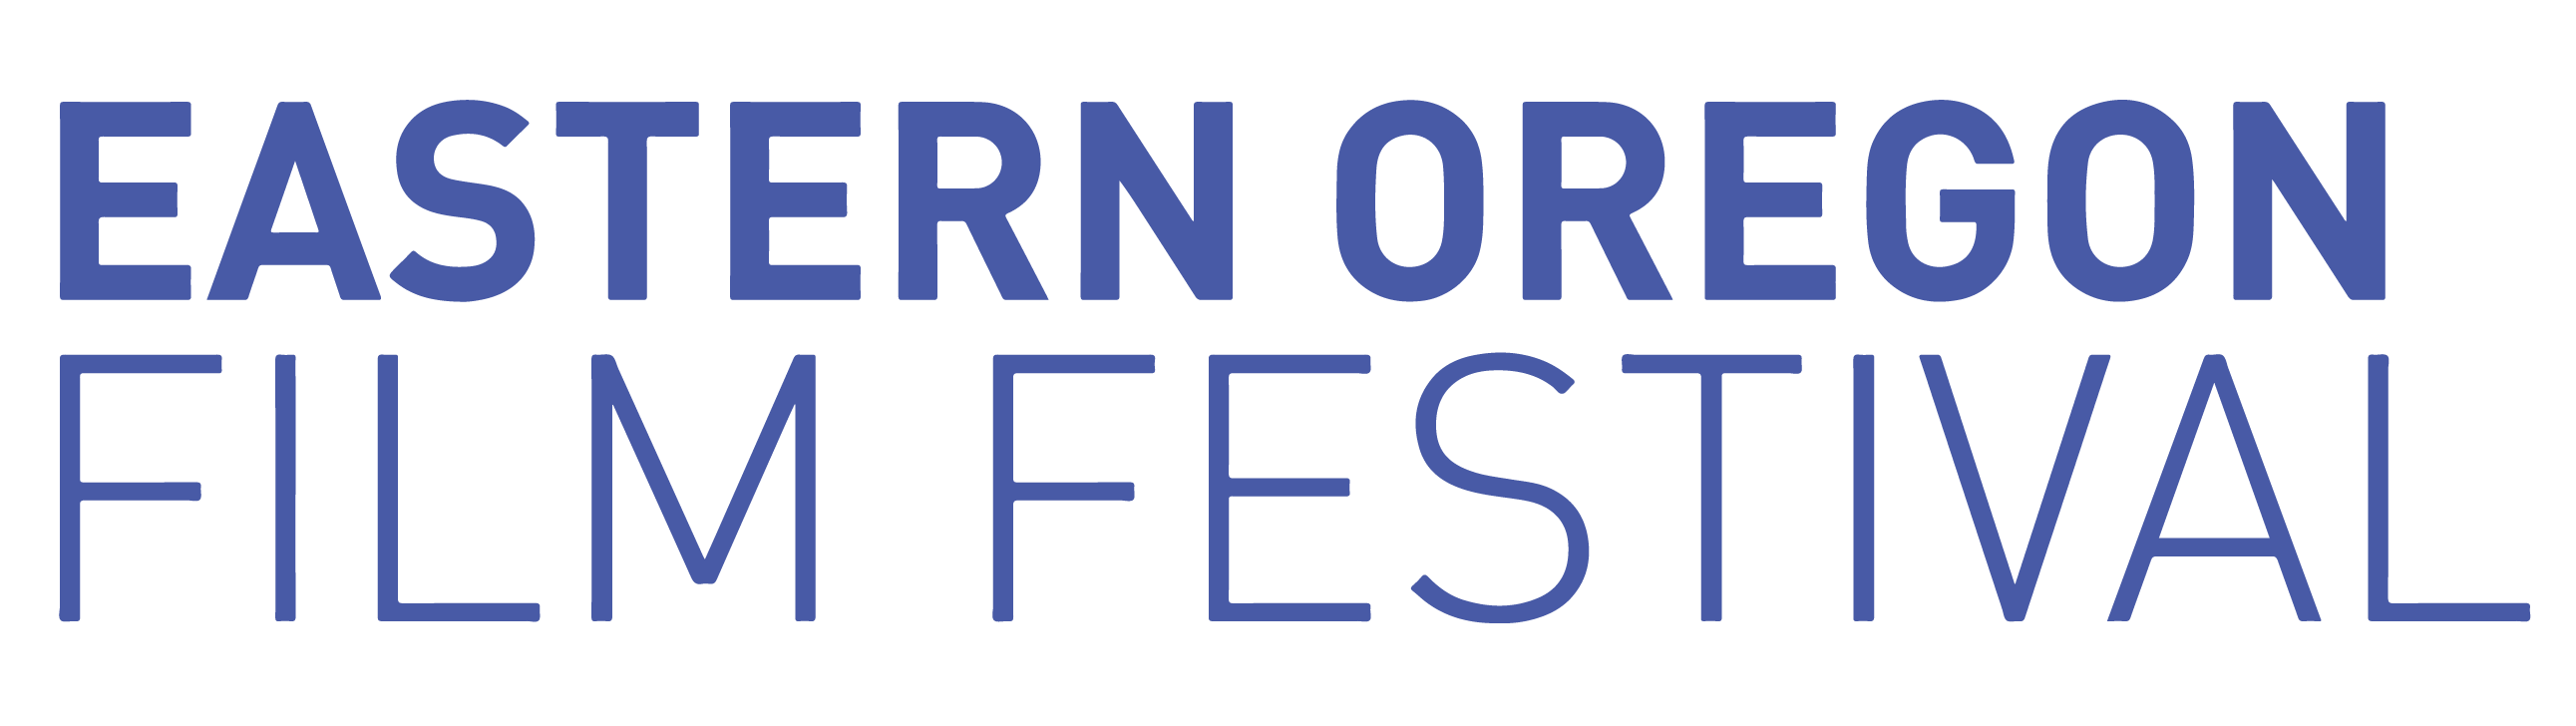 Eastern Oregon Film Festival